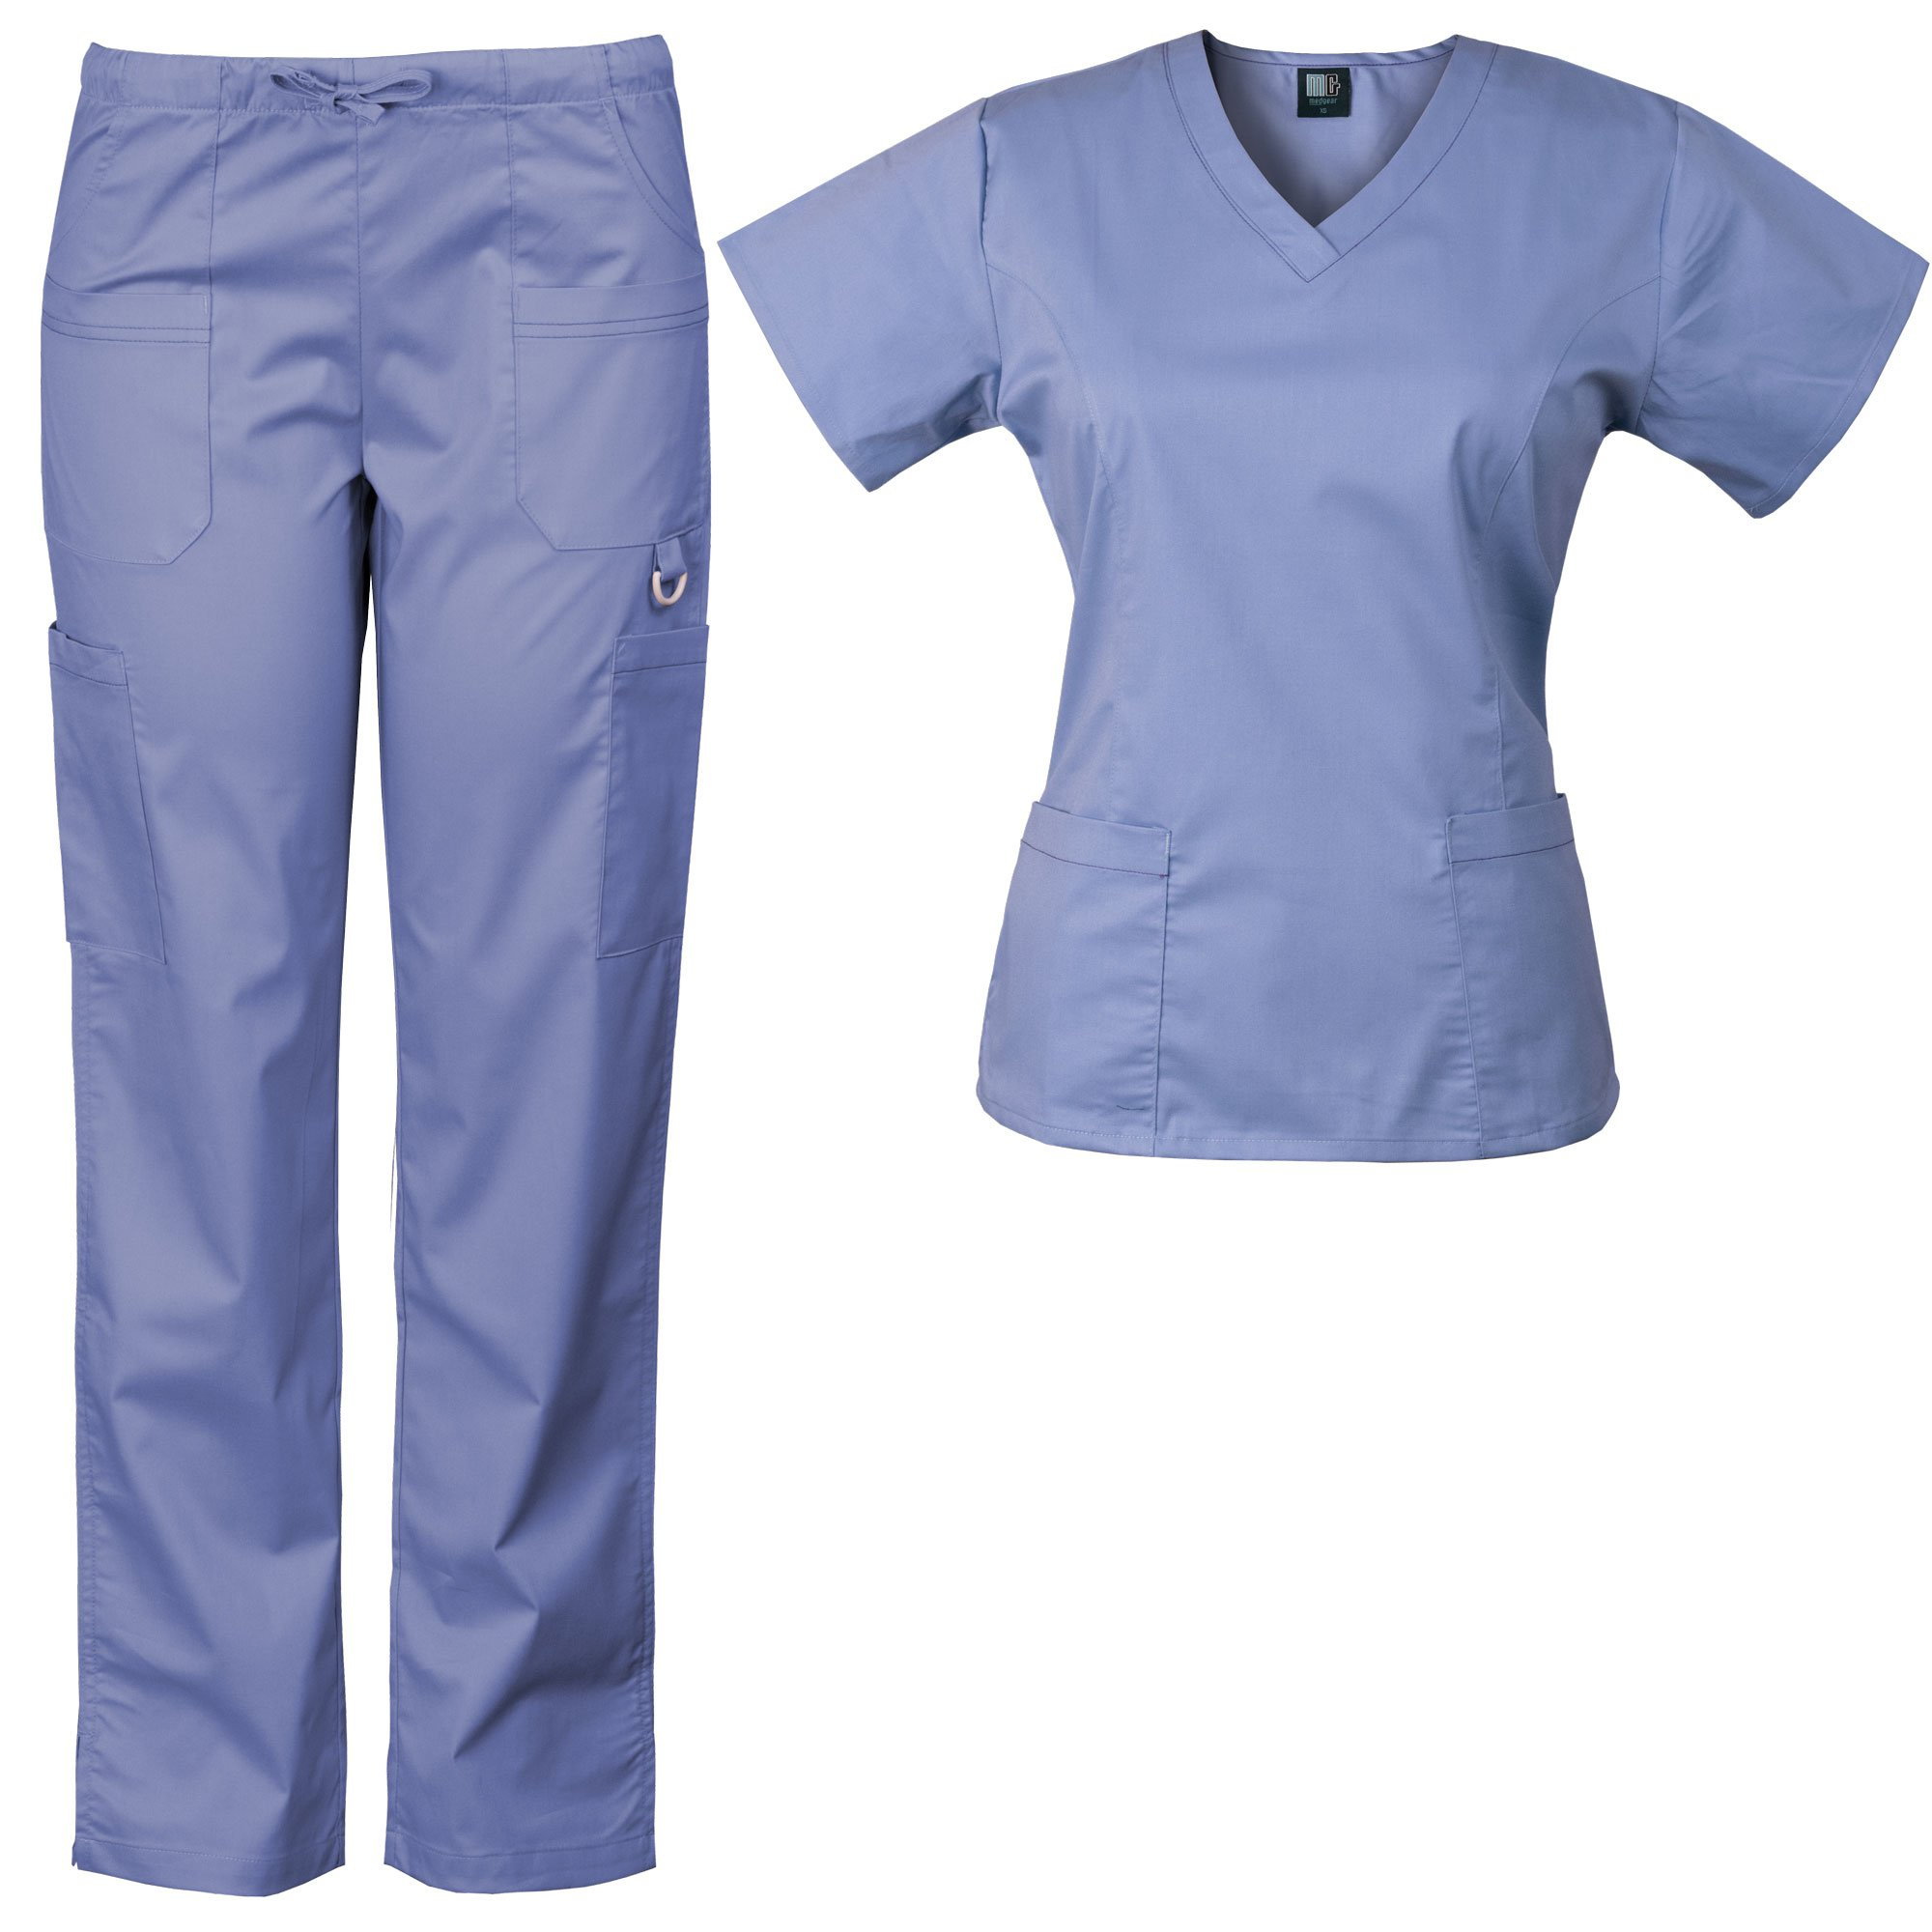 Medgear Women's Solid Scrubs Set Eversoft 2-Way Stretch Fabric 7895ST (L, Ceil)